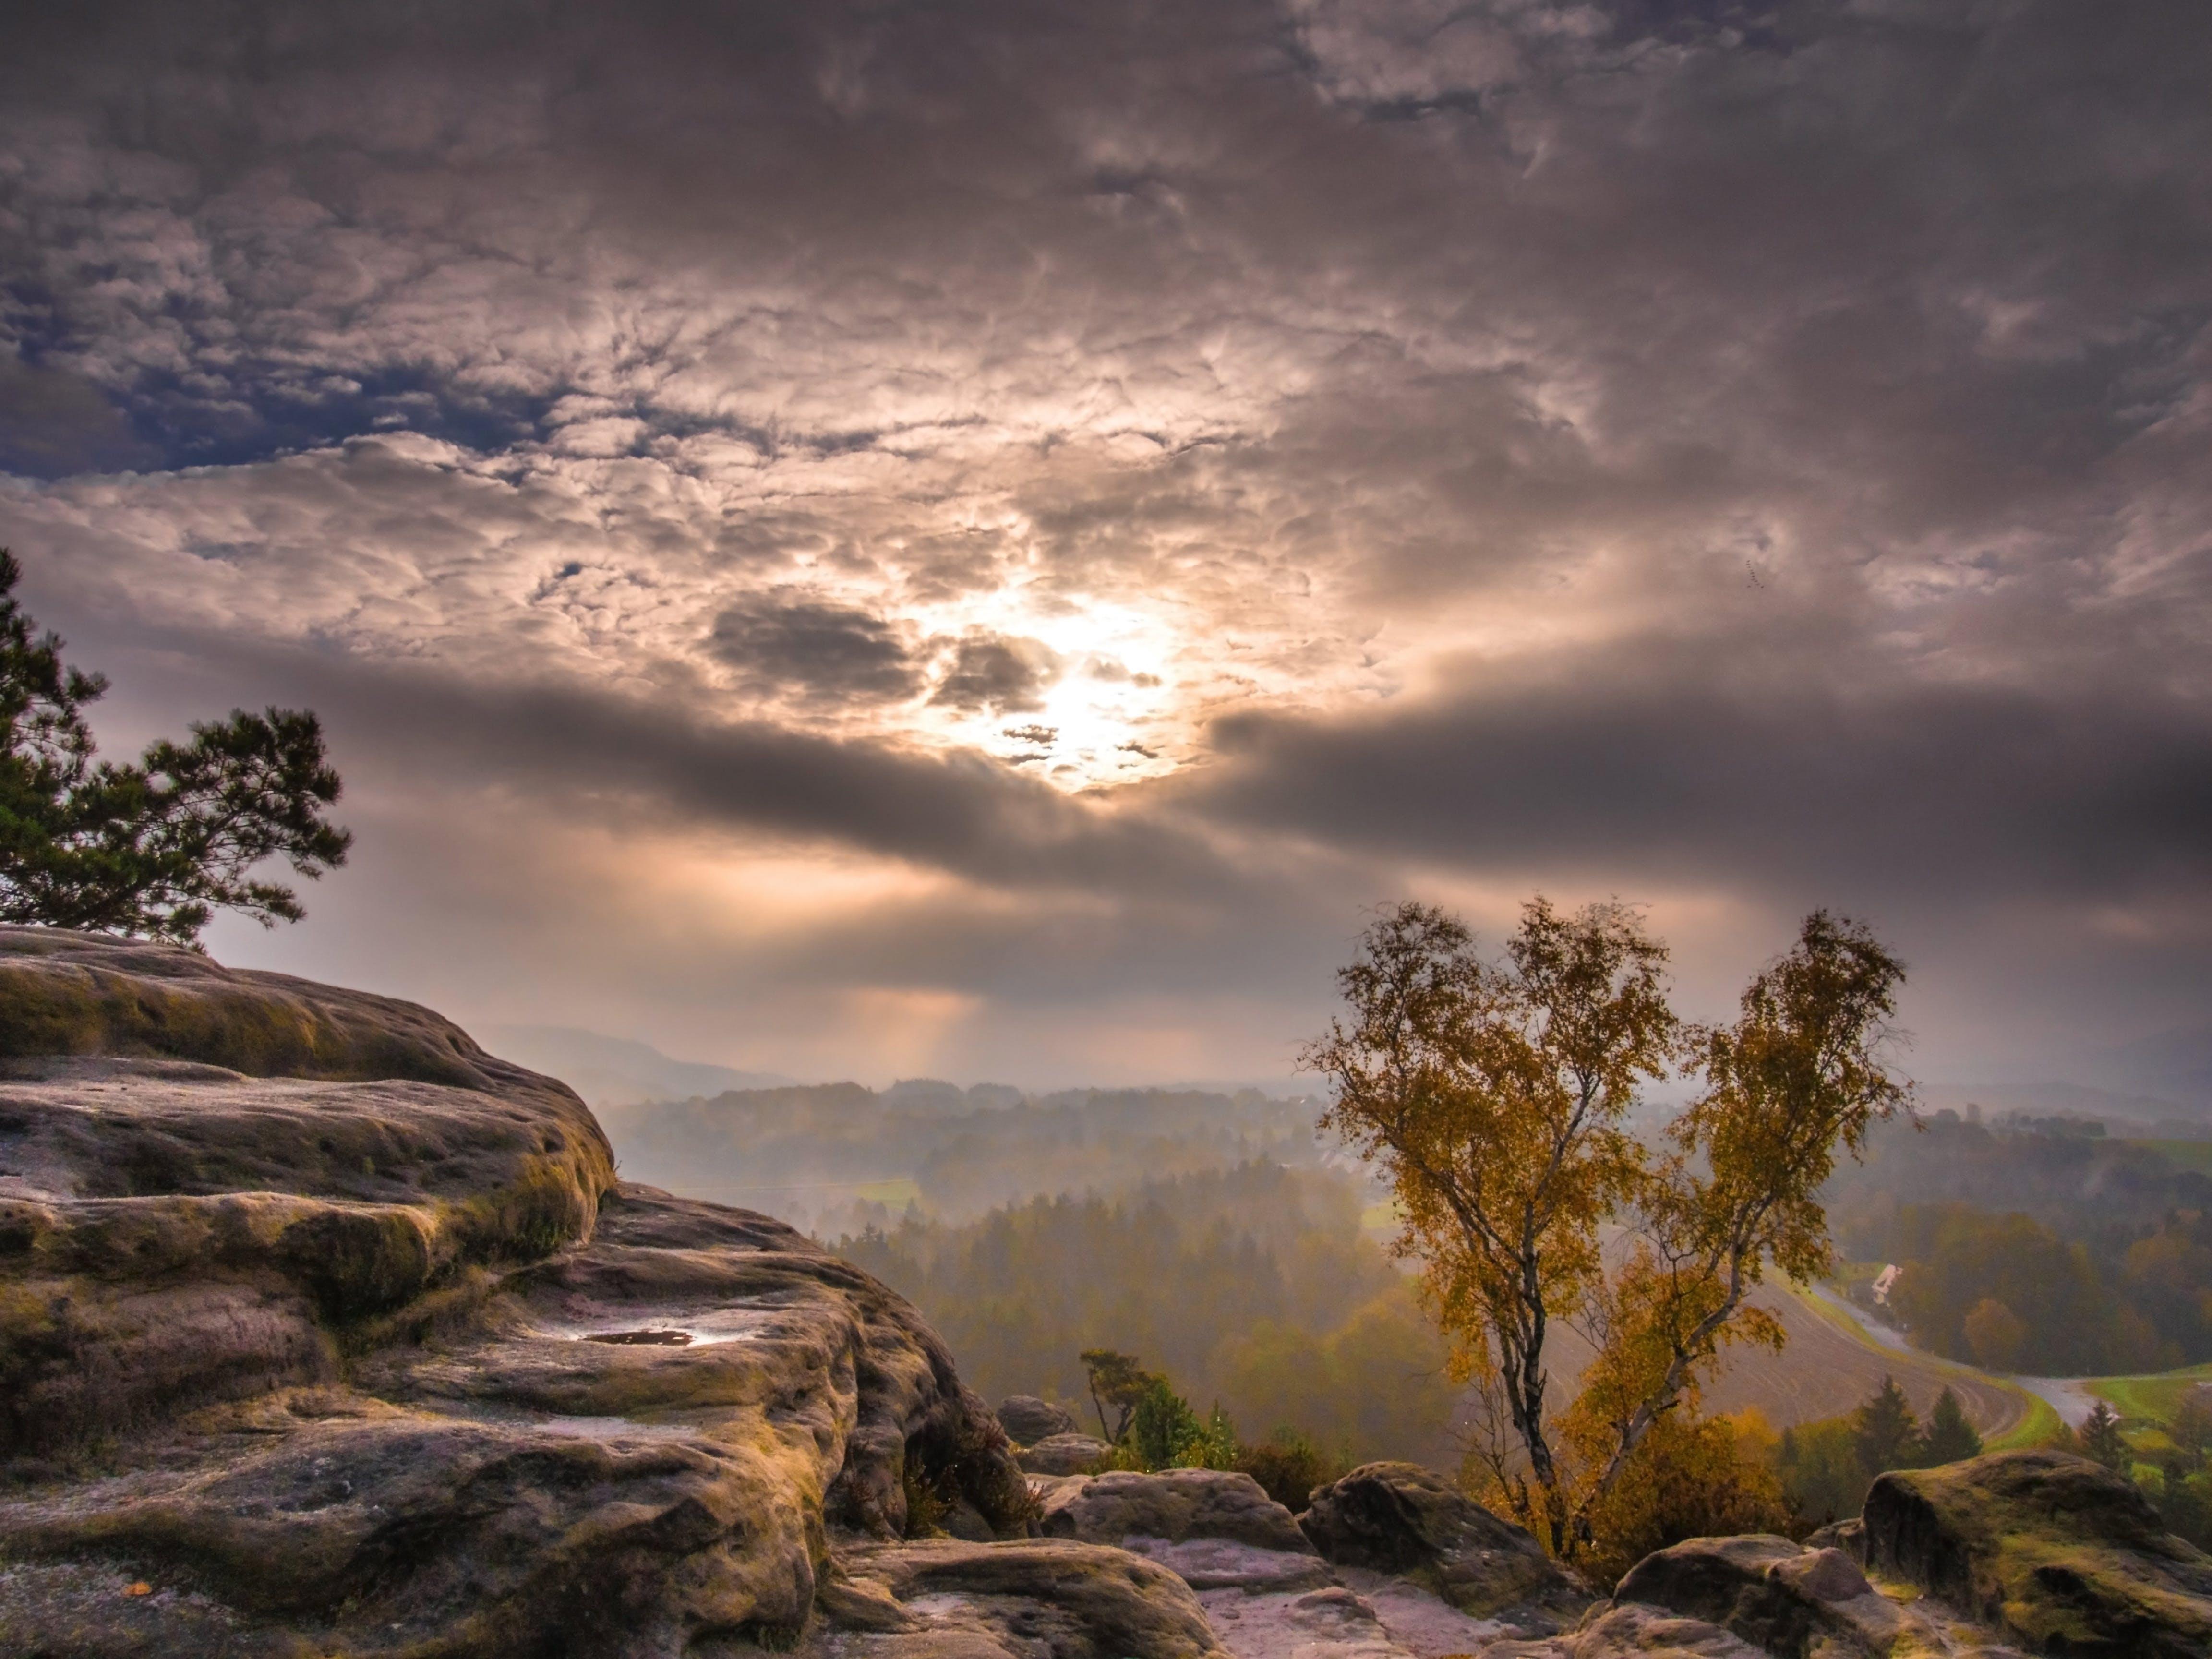 Free stock photo of landscape, mountains, sun, hiking